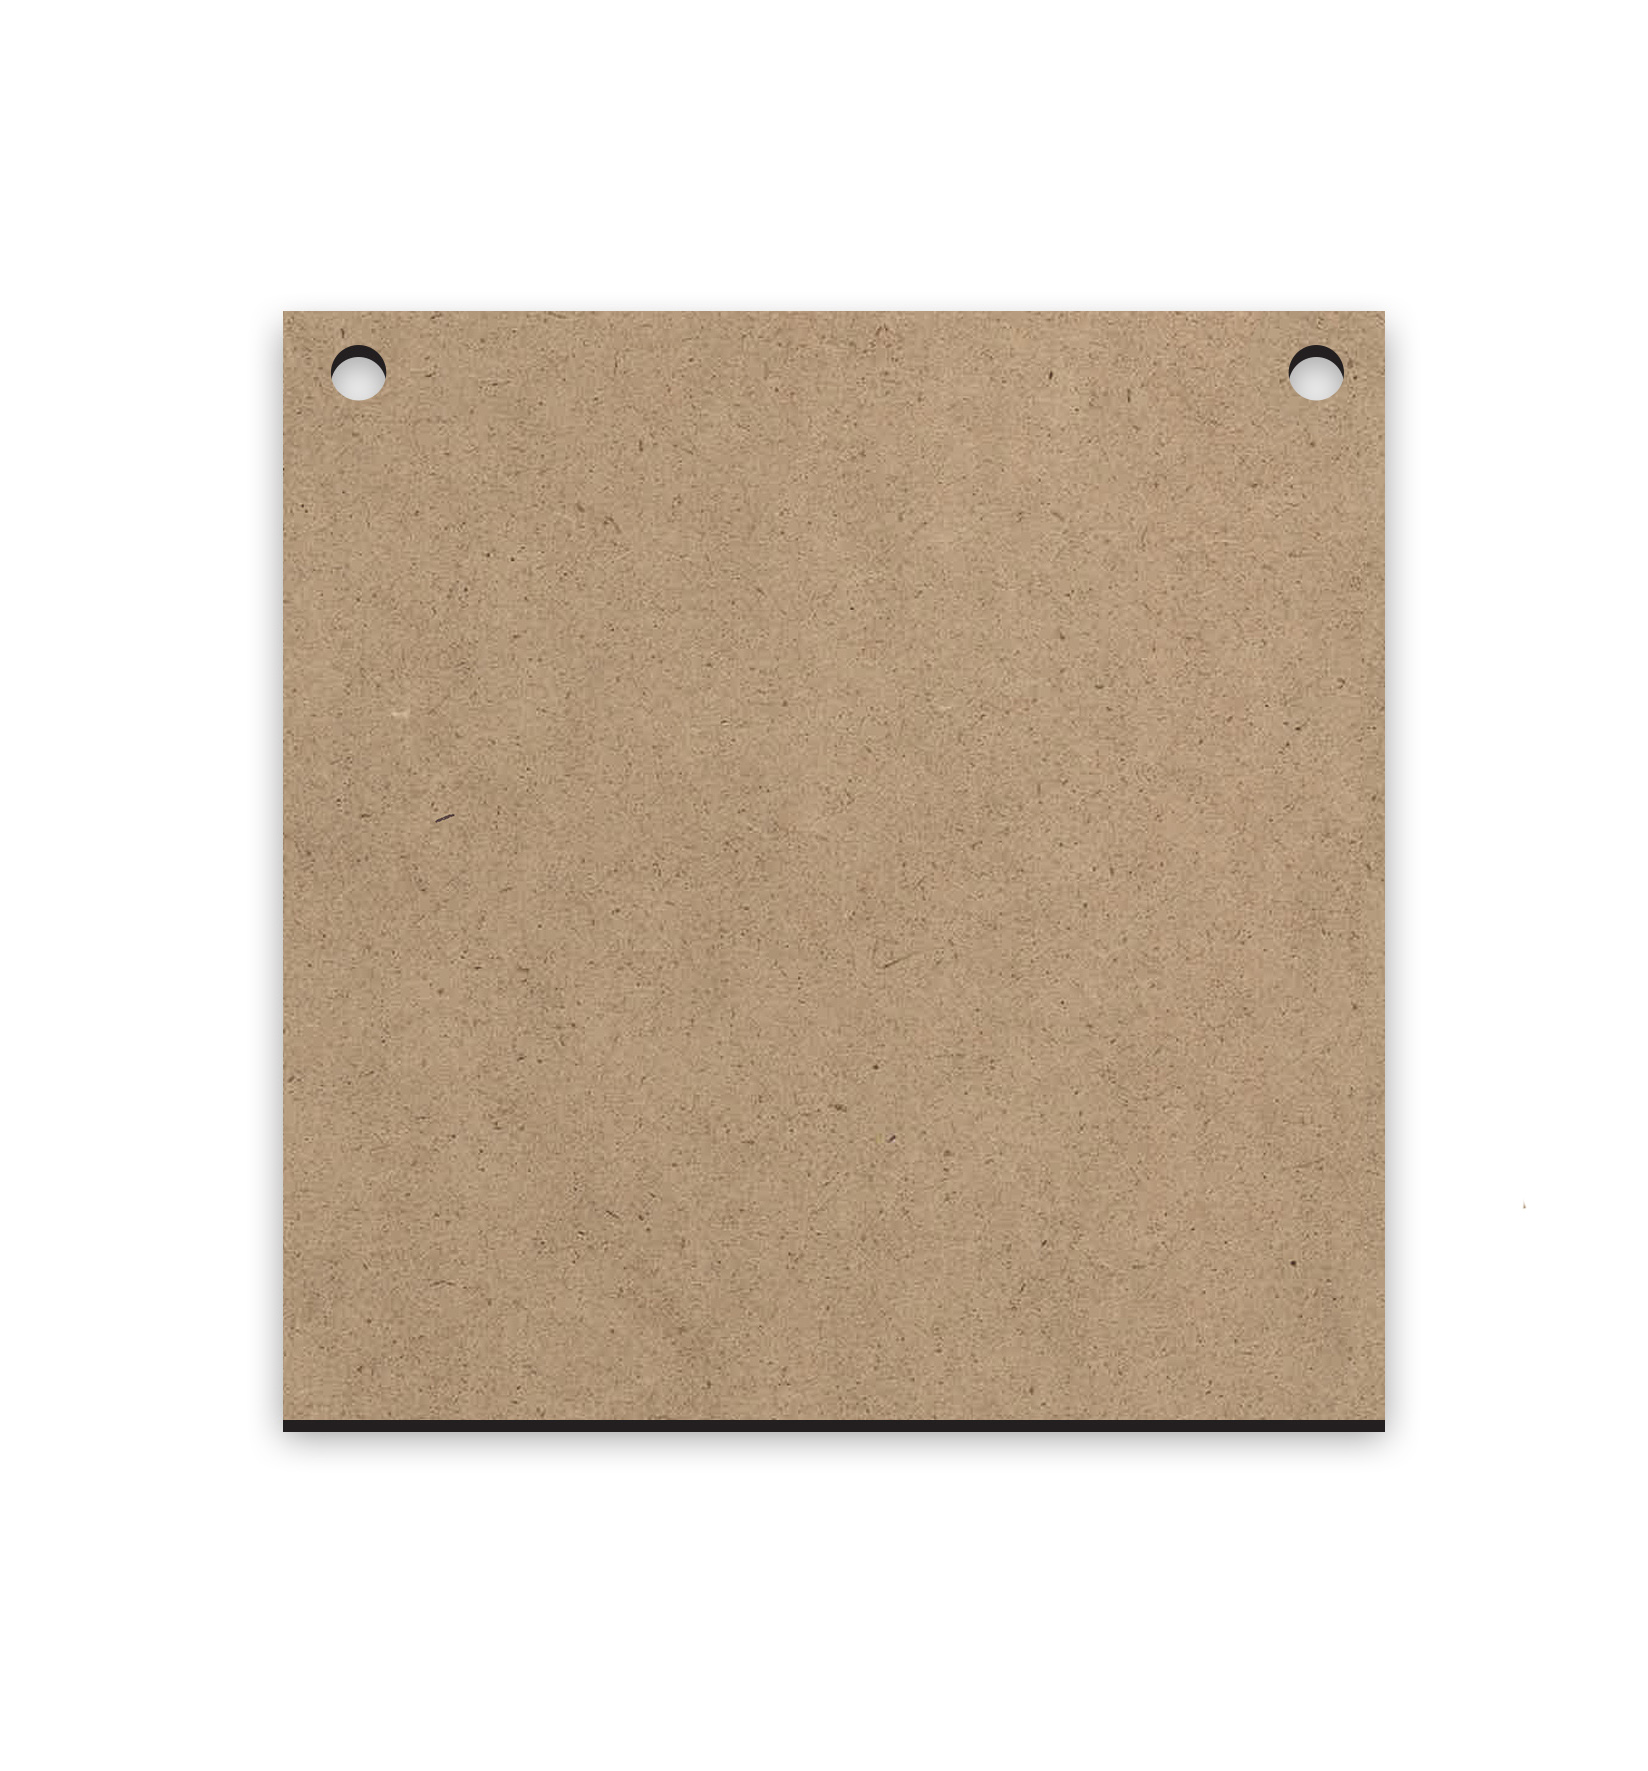 "Small Square | Mini Ornament Wood Surface #22 | Size 4"" x 4"""